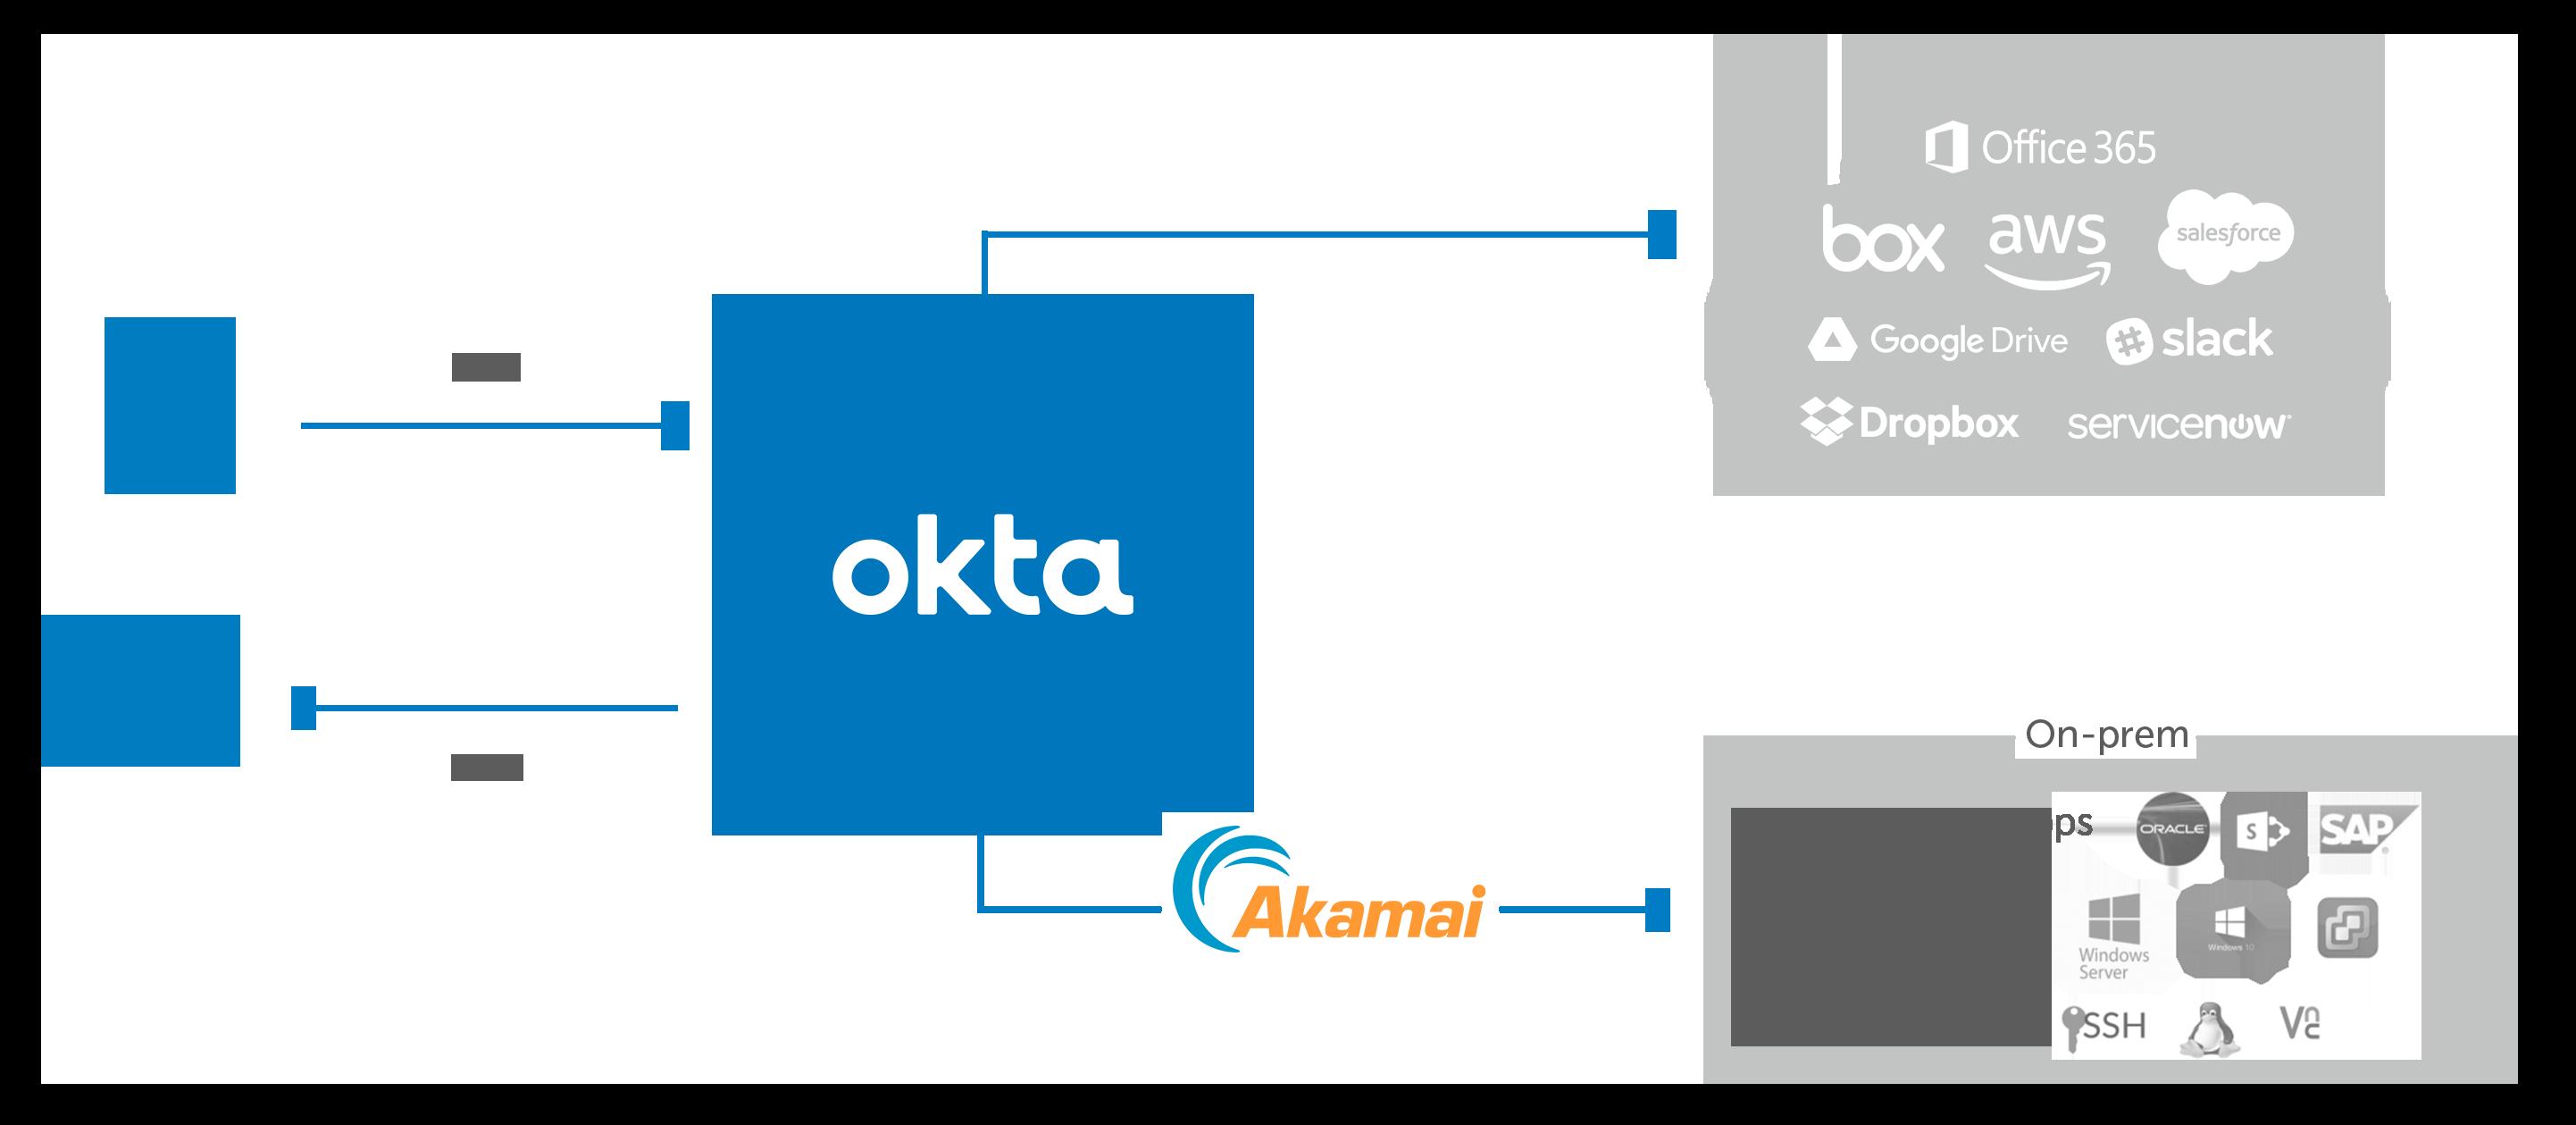 Akamai Okta diagram